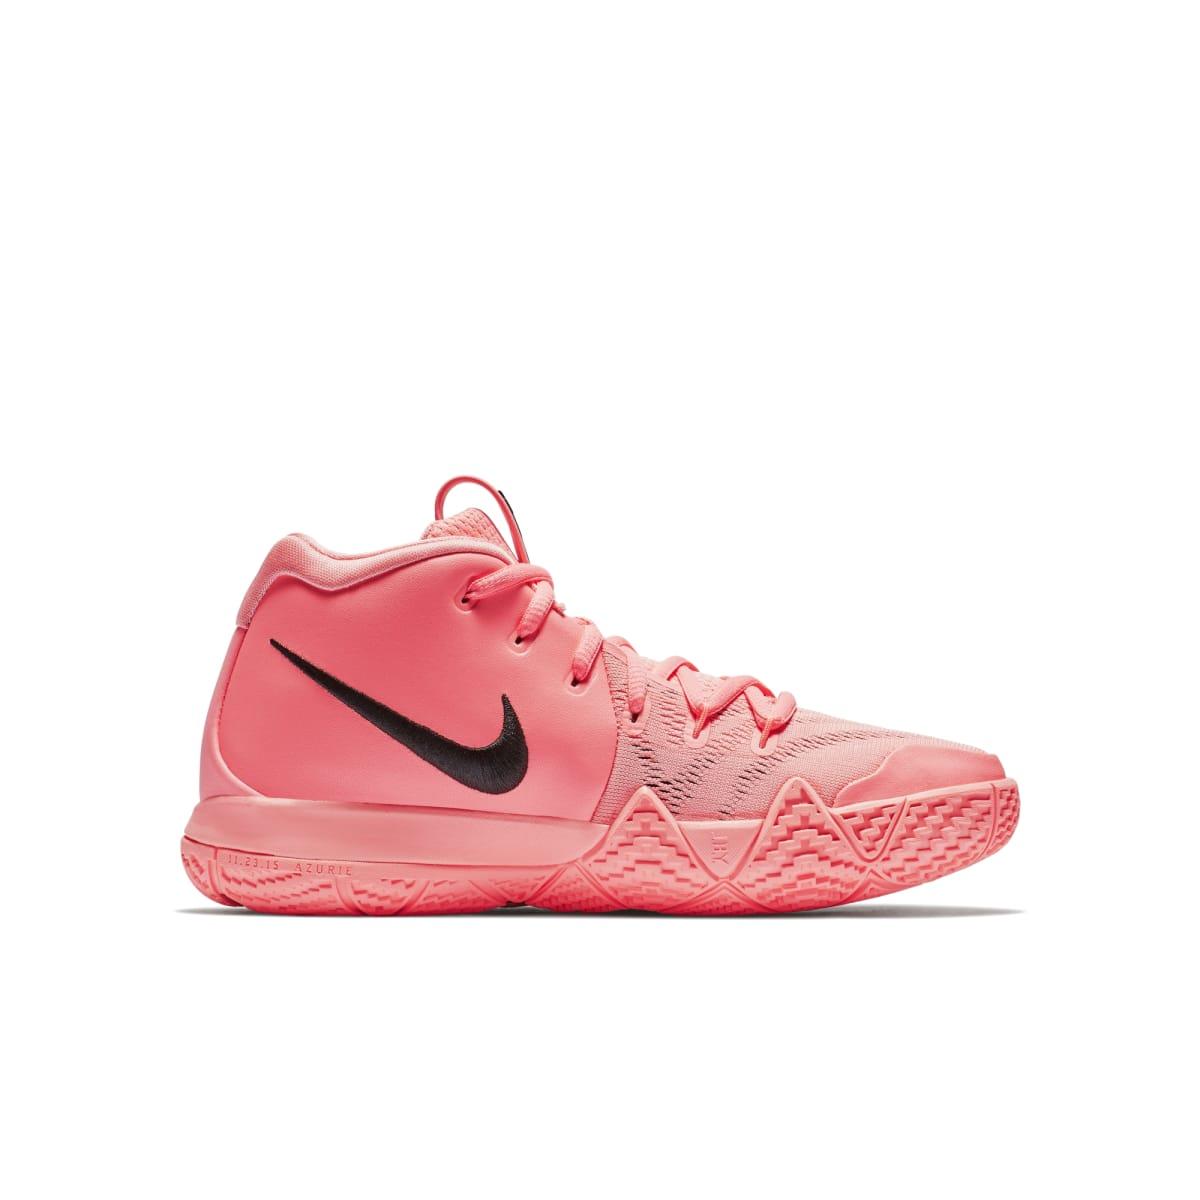 Nike Kyrie 4 Pink (GS) | Nike | Sole